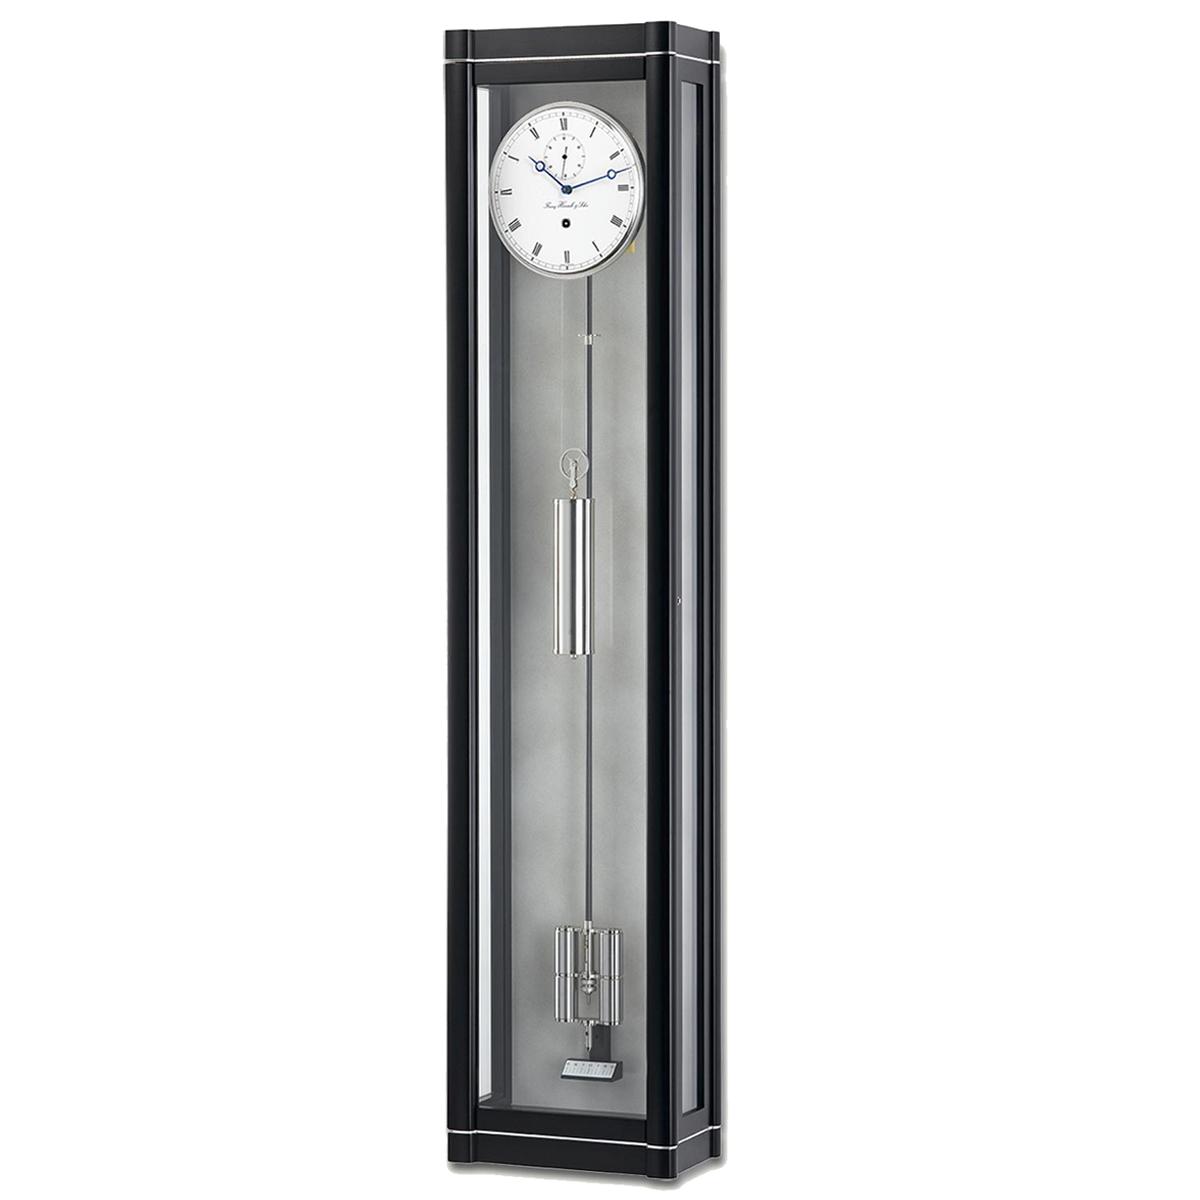 Hermle KINGSLAND-70961-740761 Regulator Wall Clock